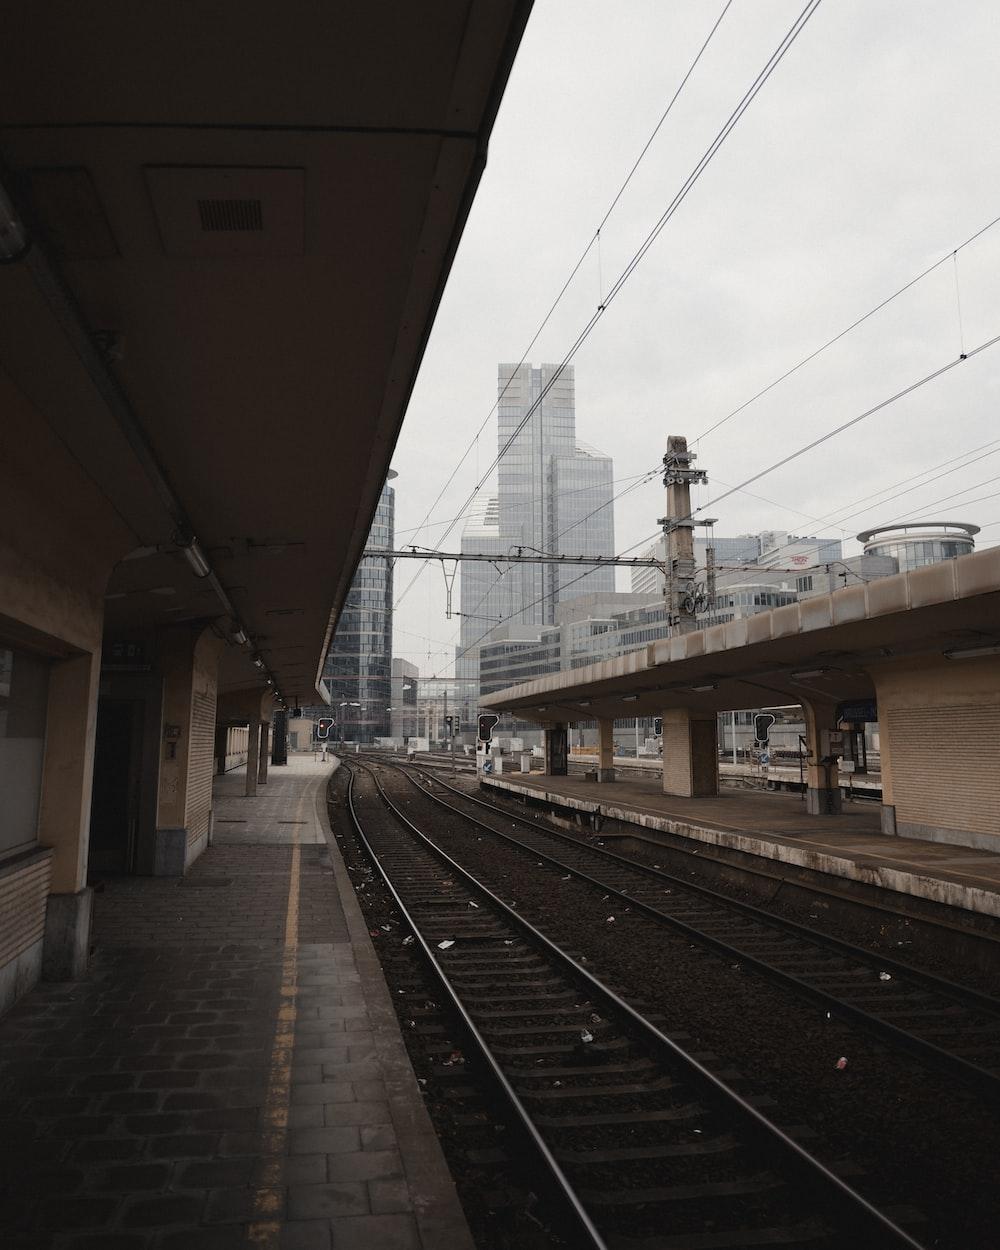 train rail under white sky during daytime